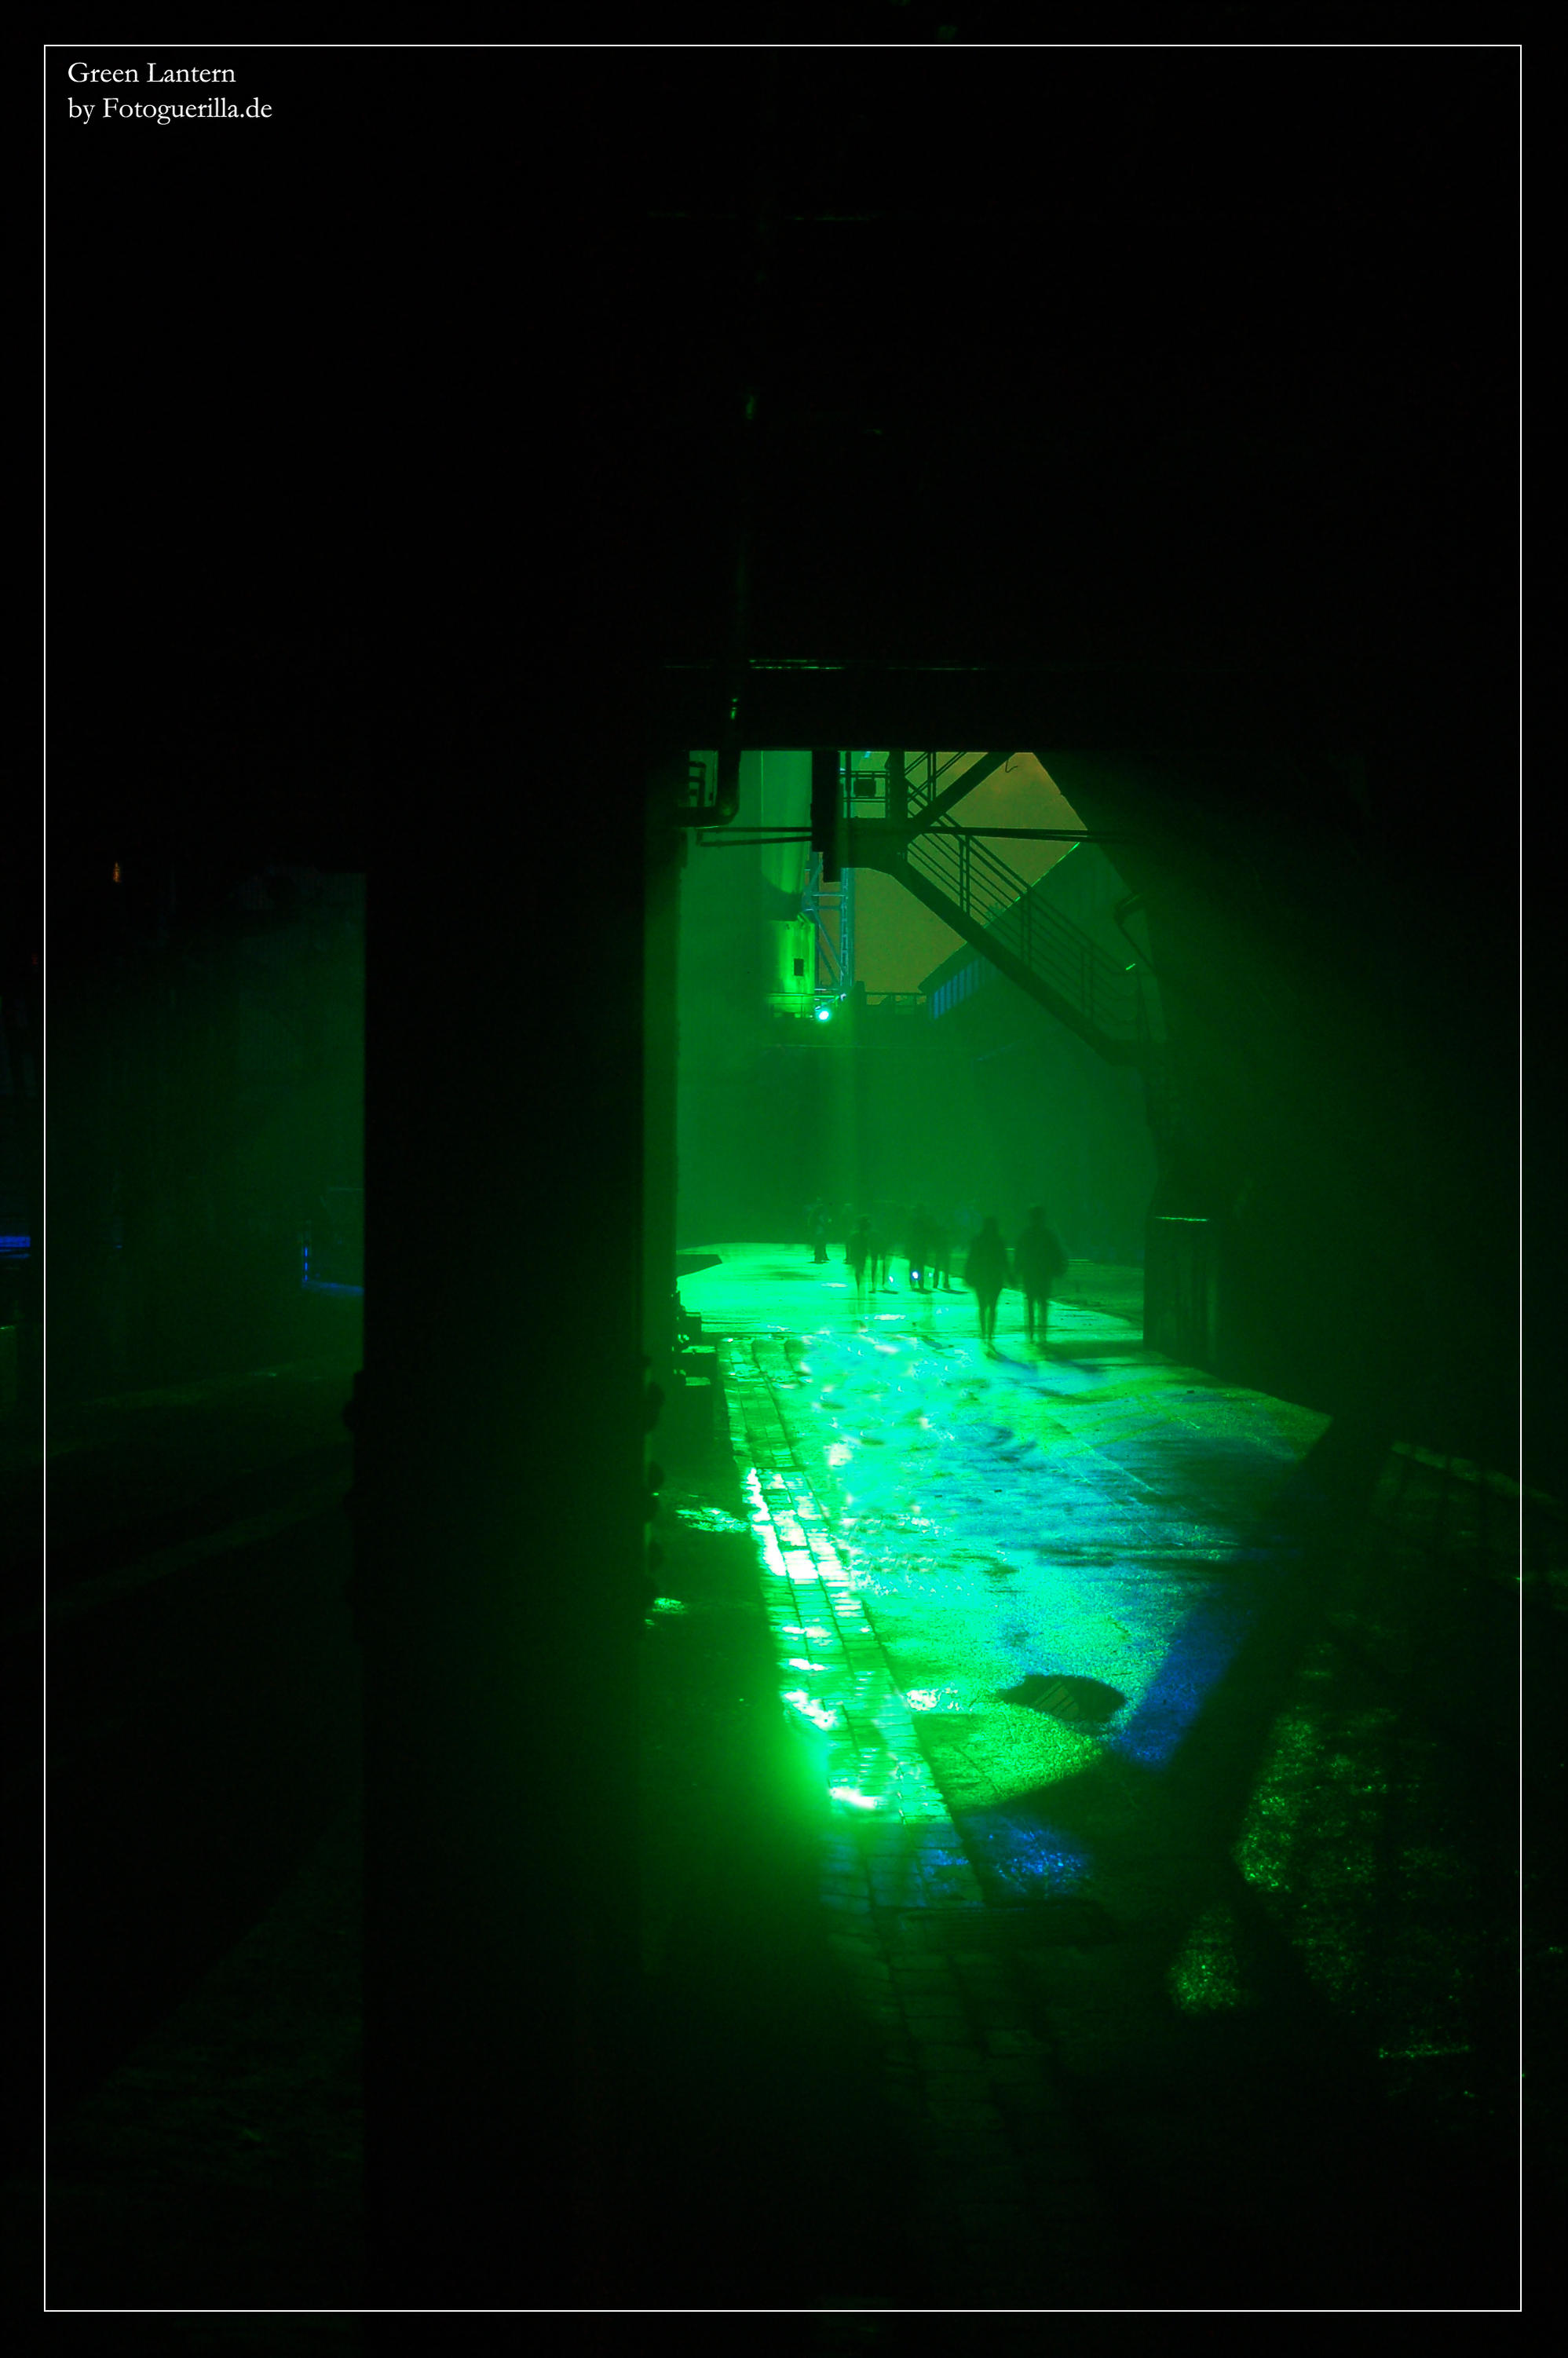 Green Lantern by fotoguerilla